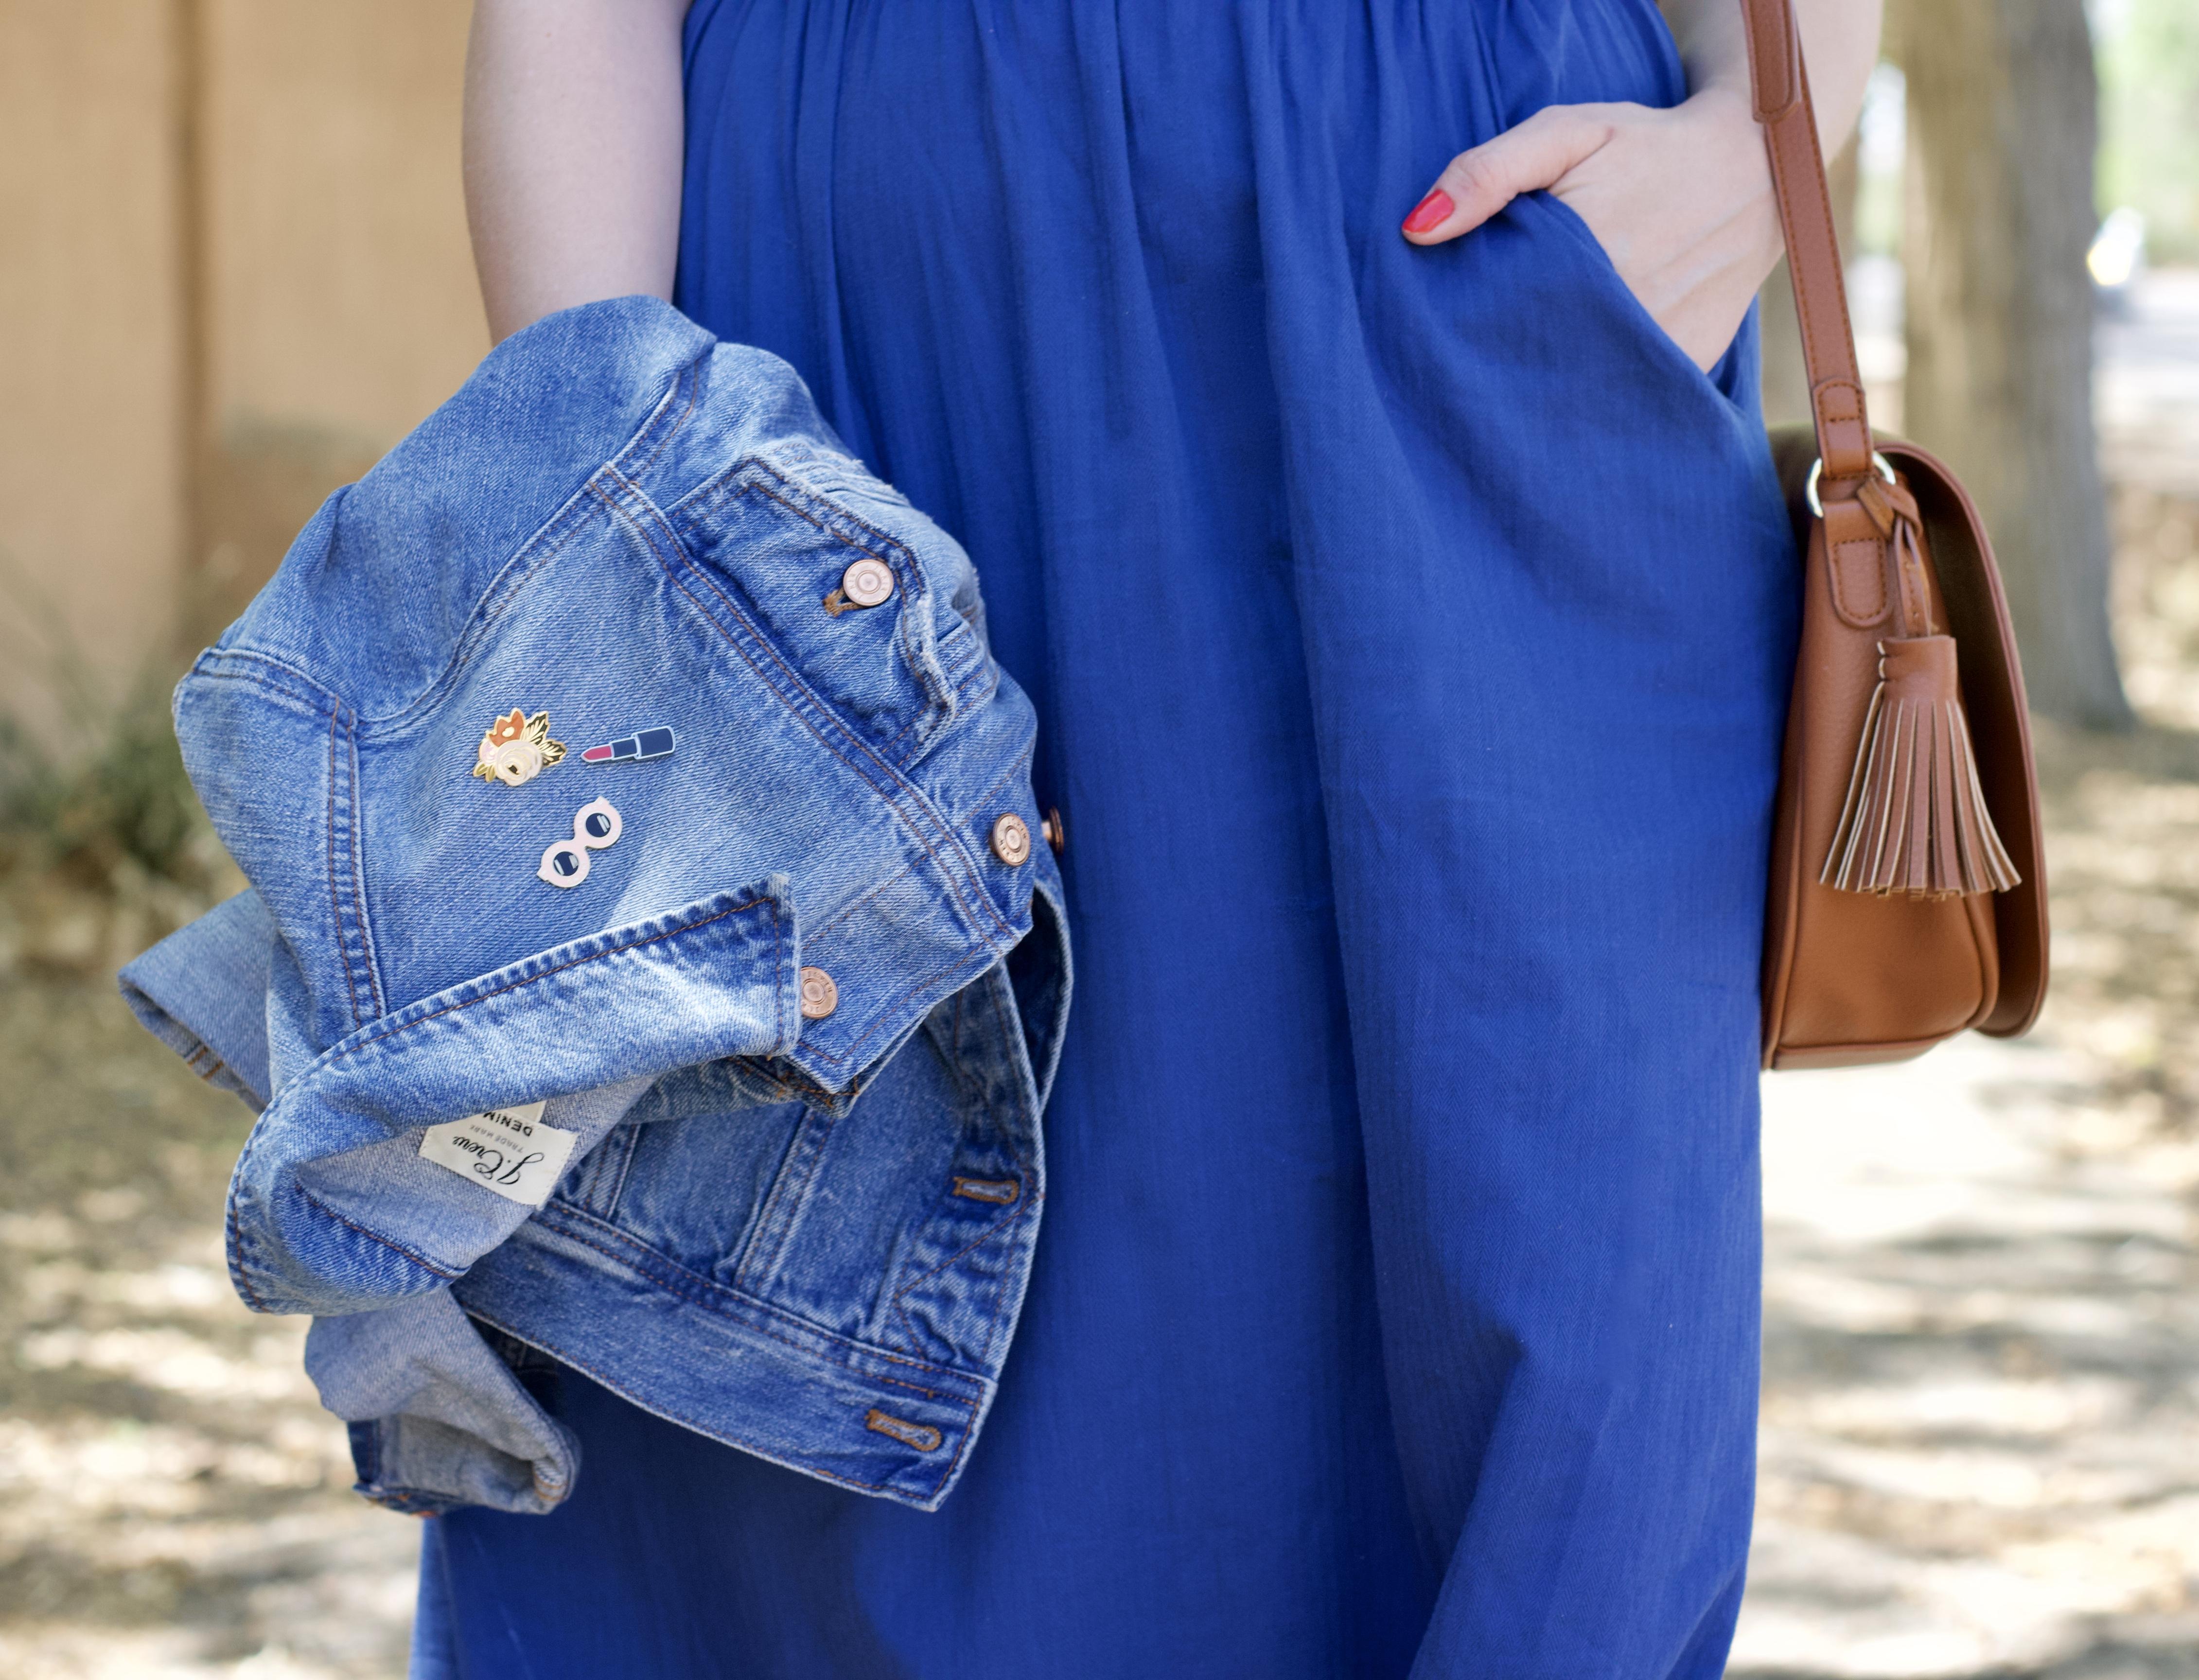 jcrew denim jacket enamel pins #jcrew #denimjacket #outfitdetails #accessories